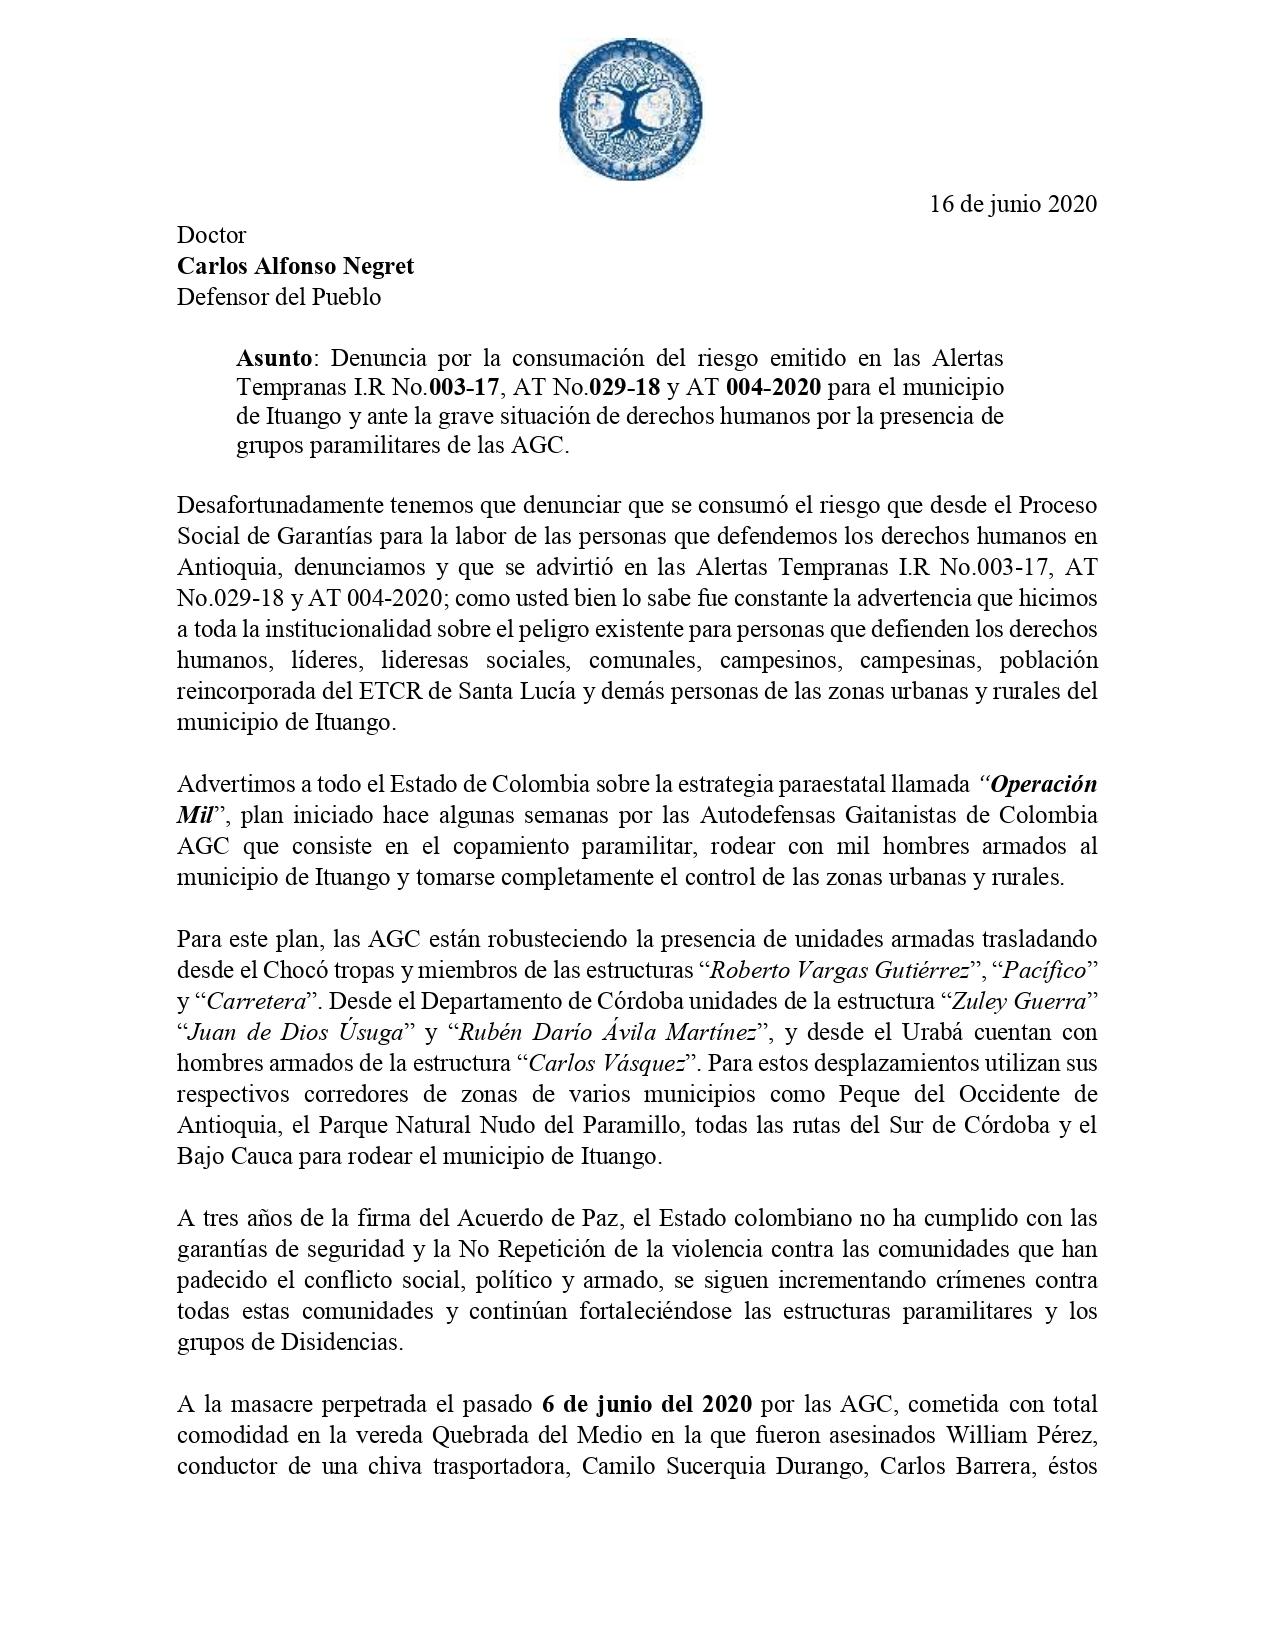 Denuncia de Riesgo Consumado para el municipio de Ituango-Final_page-0001